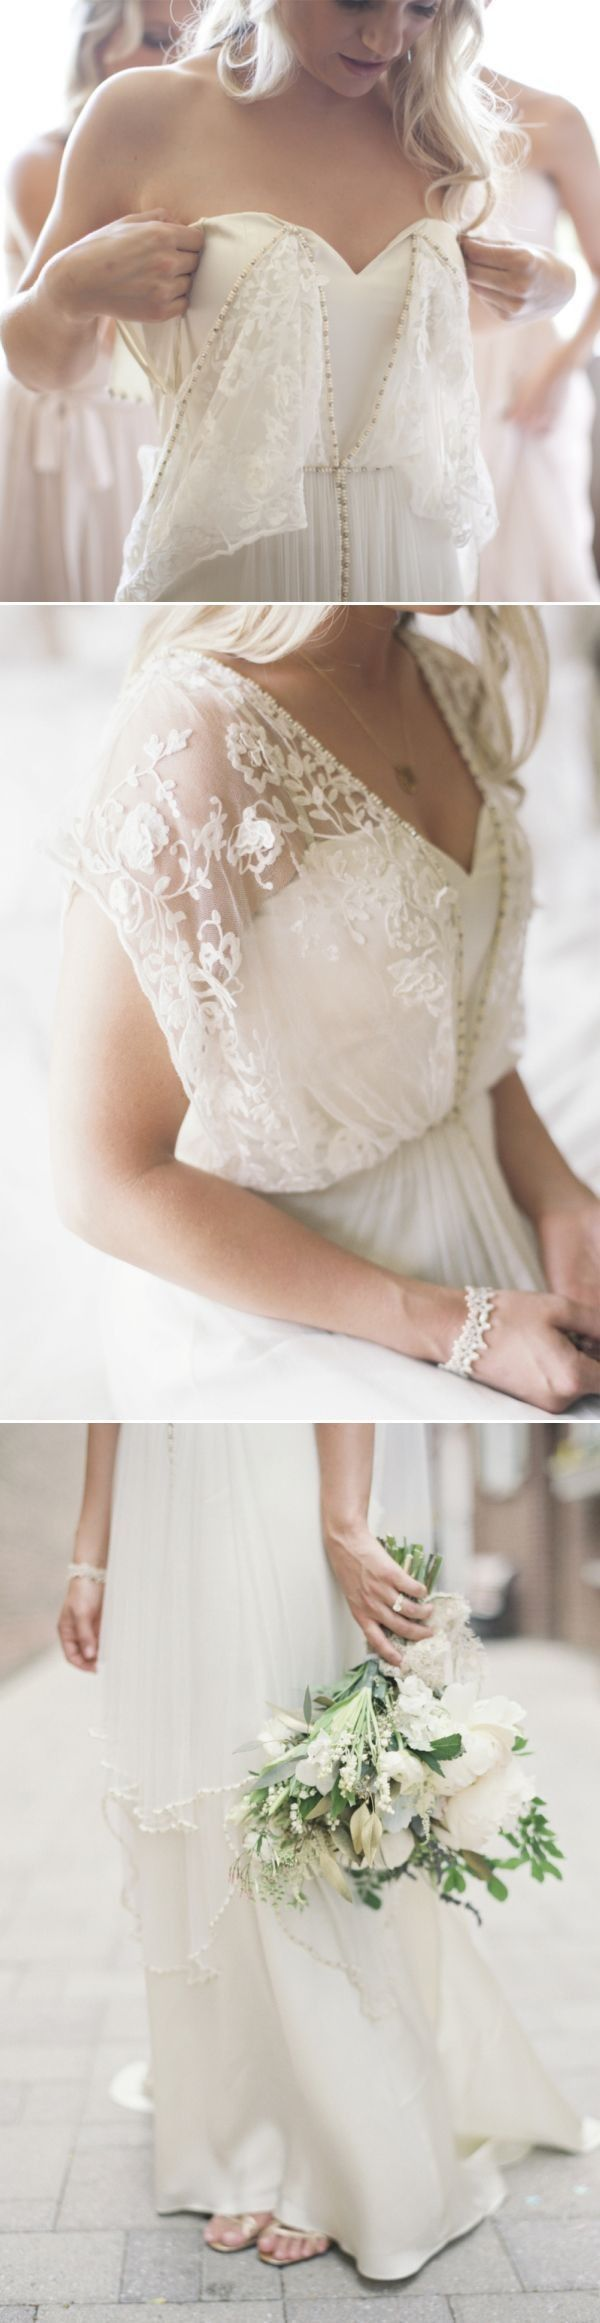 Top vintage wedding dresses for trends boho style wedding